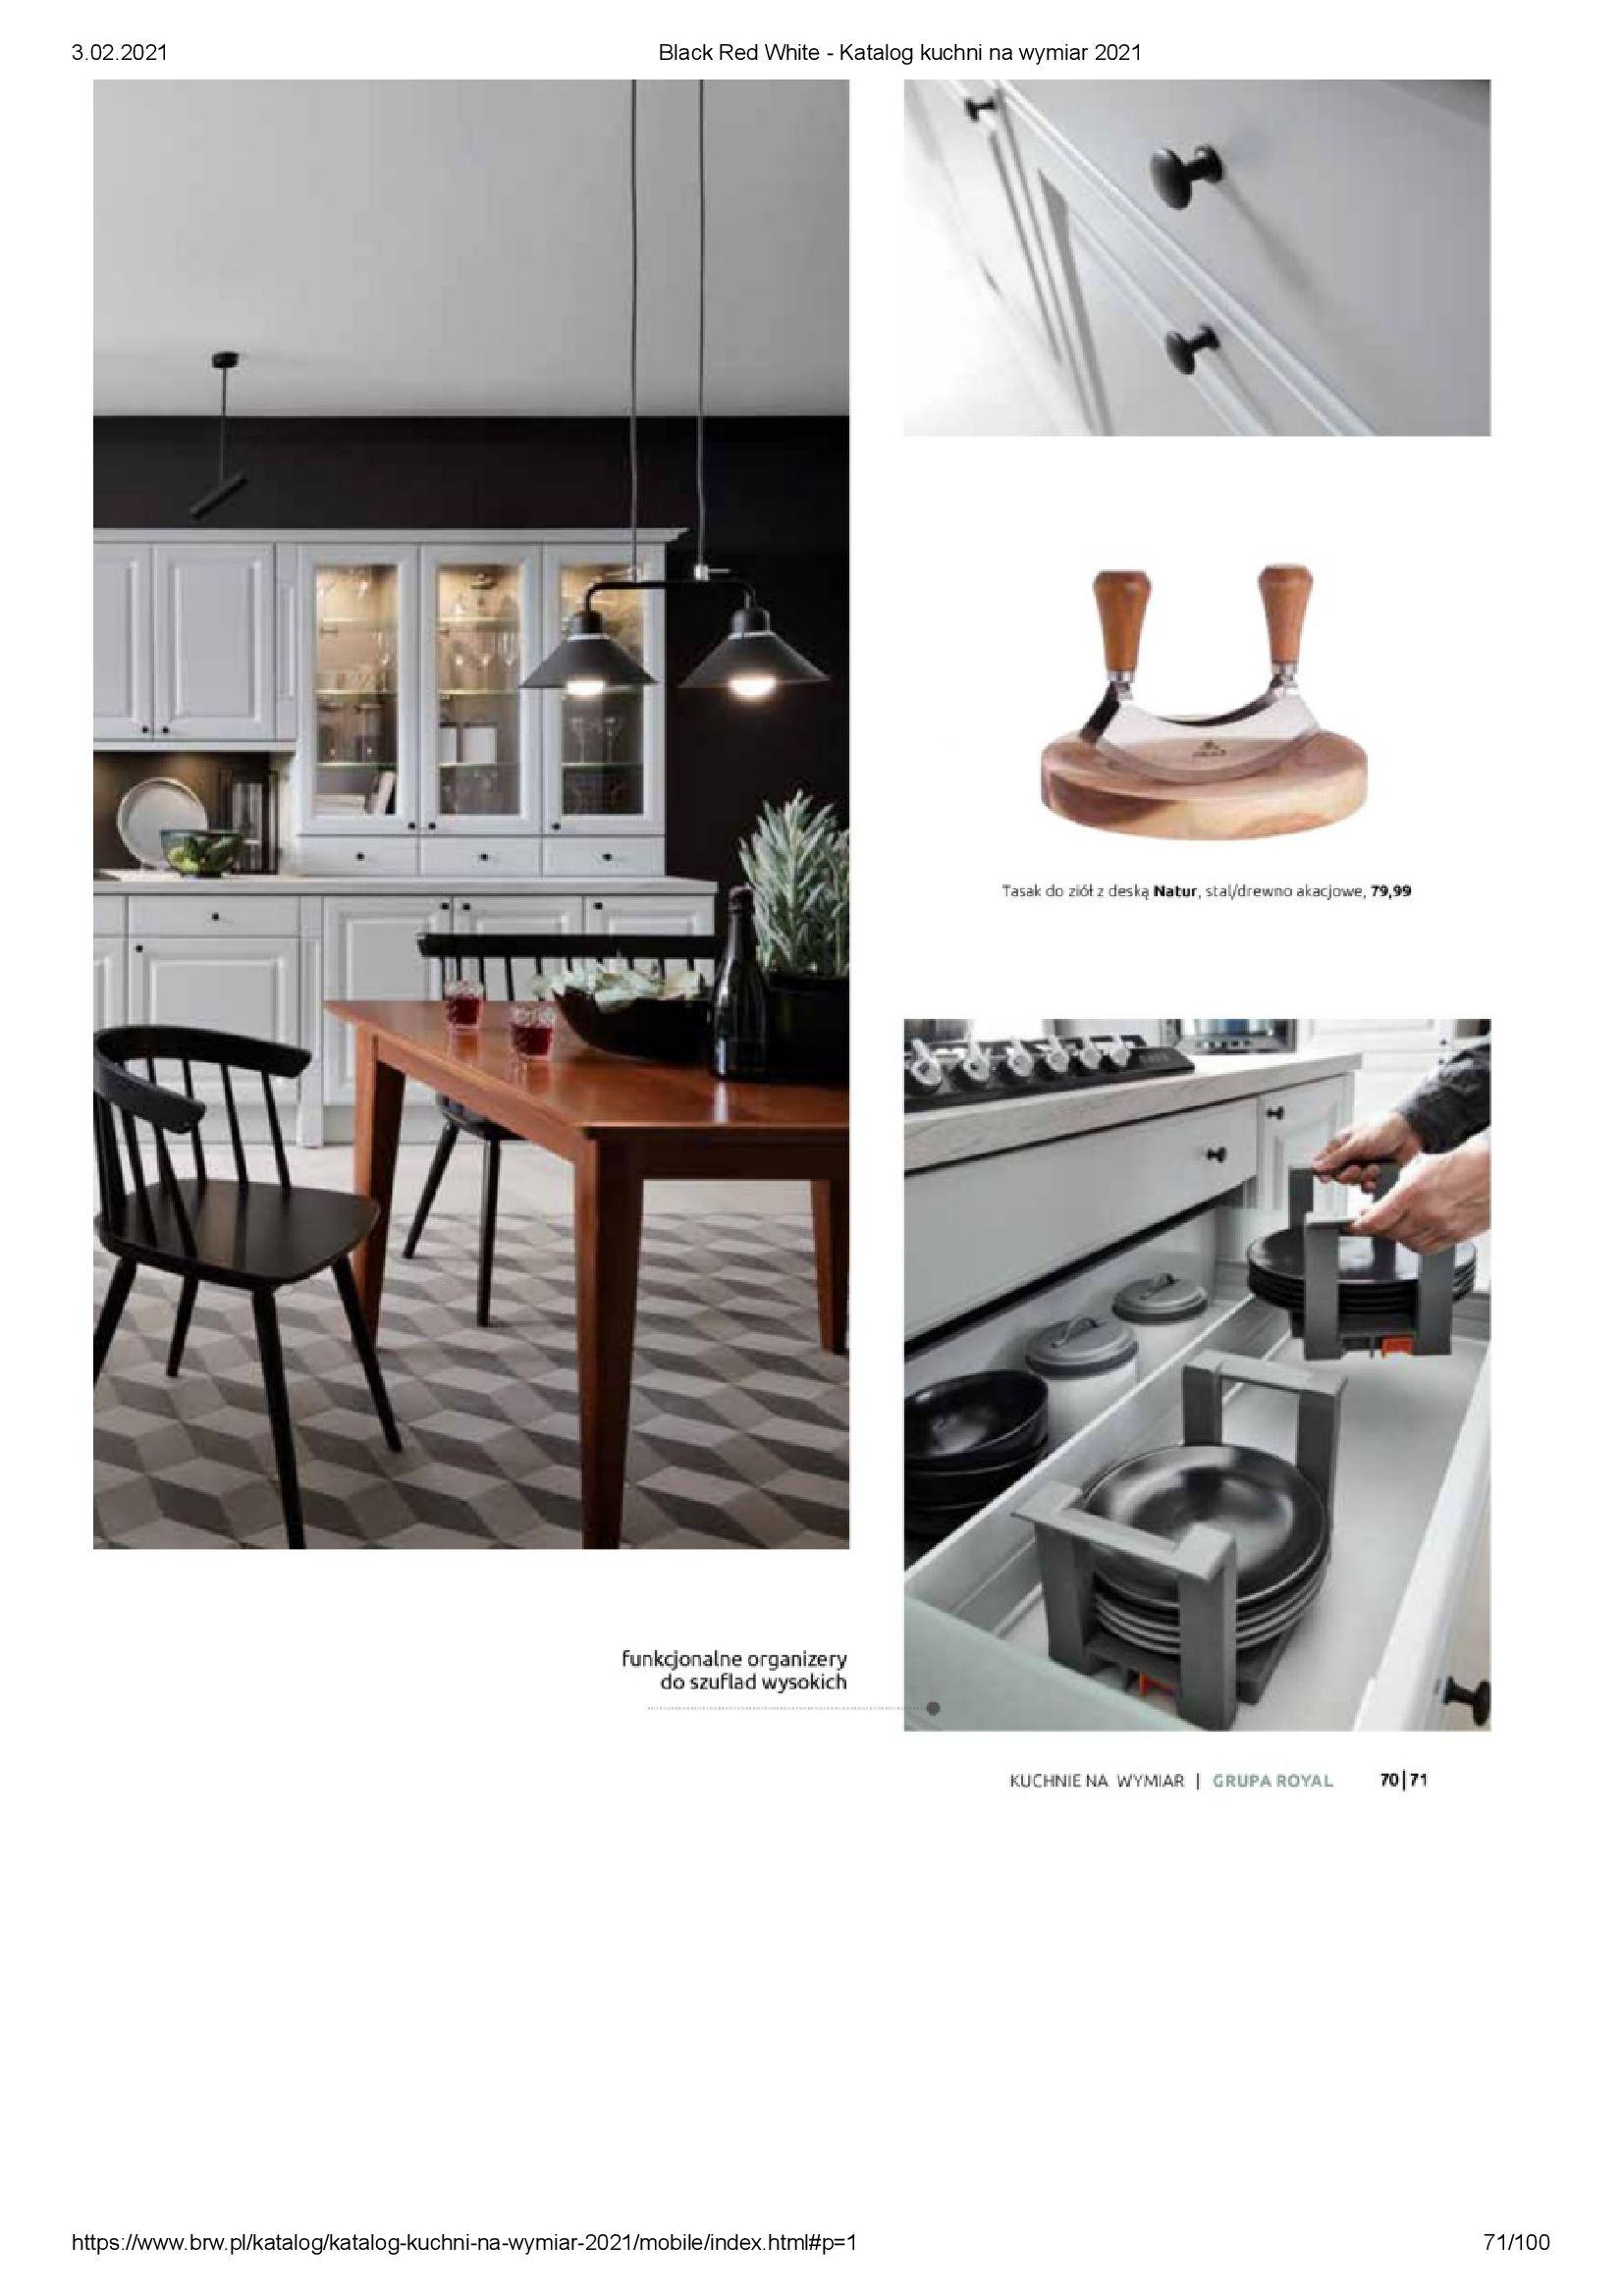 Gazetka Black Red White: Katalog - Kuchnie na wymiar Senso Kitchens 2021 2021-01-01 page-71